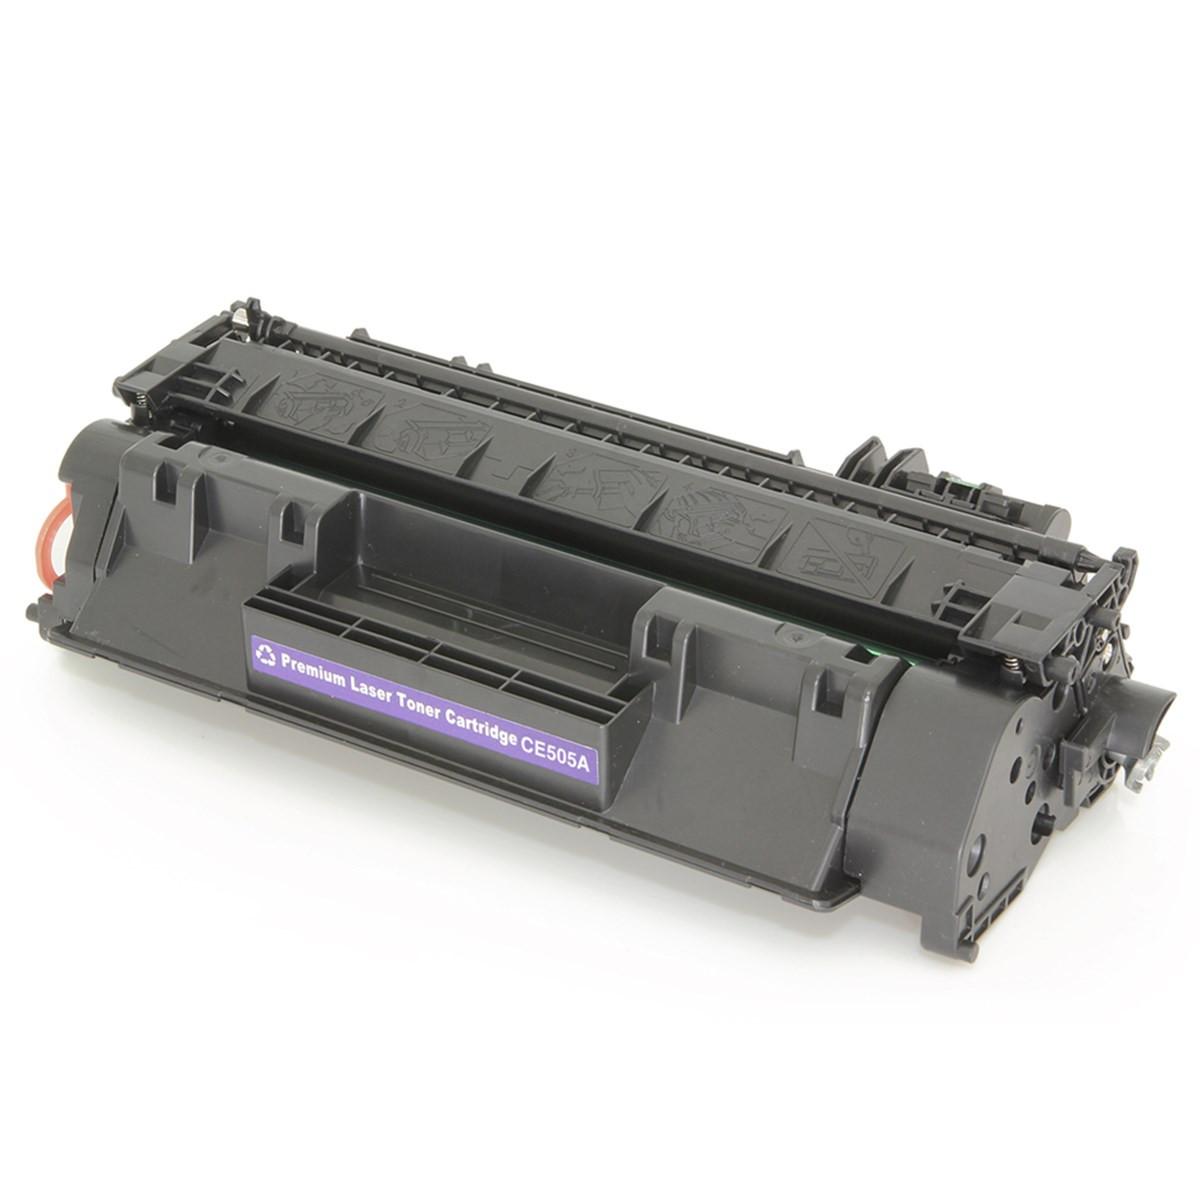 Toner Compatível com HP CF280A   M425 M401 M401N M425DN M401DNE M401DN M401DW   Premium 2.3k